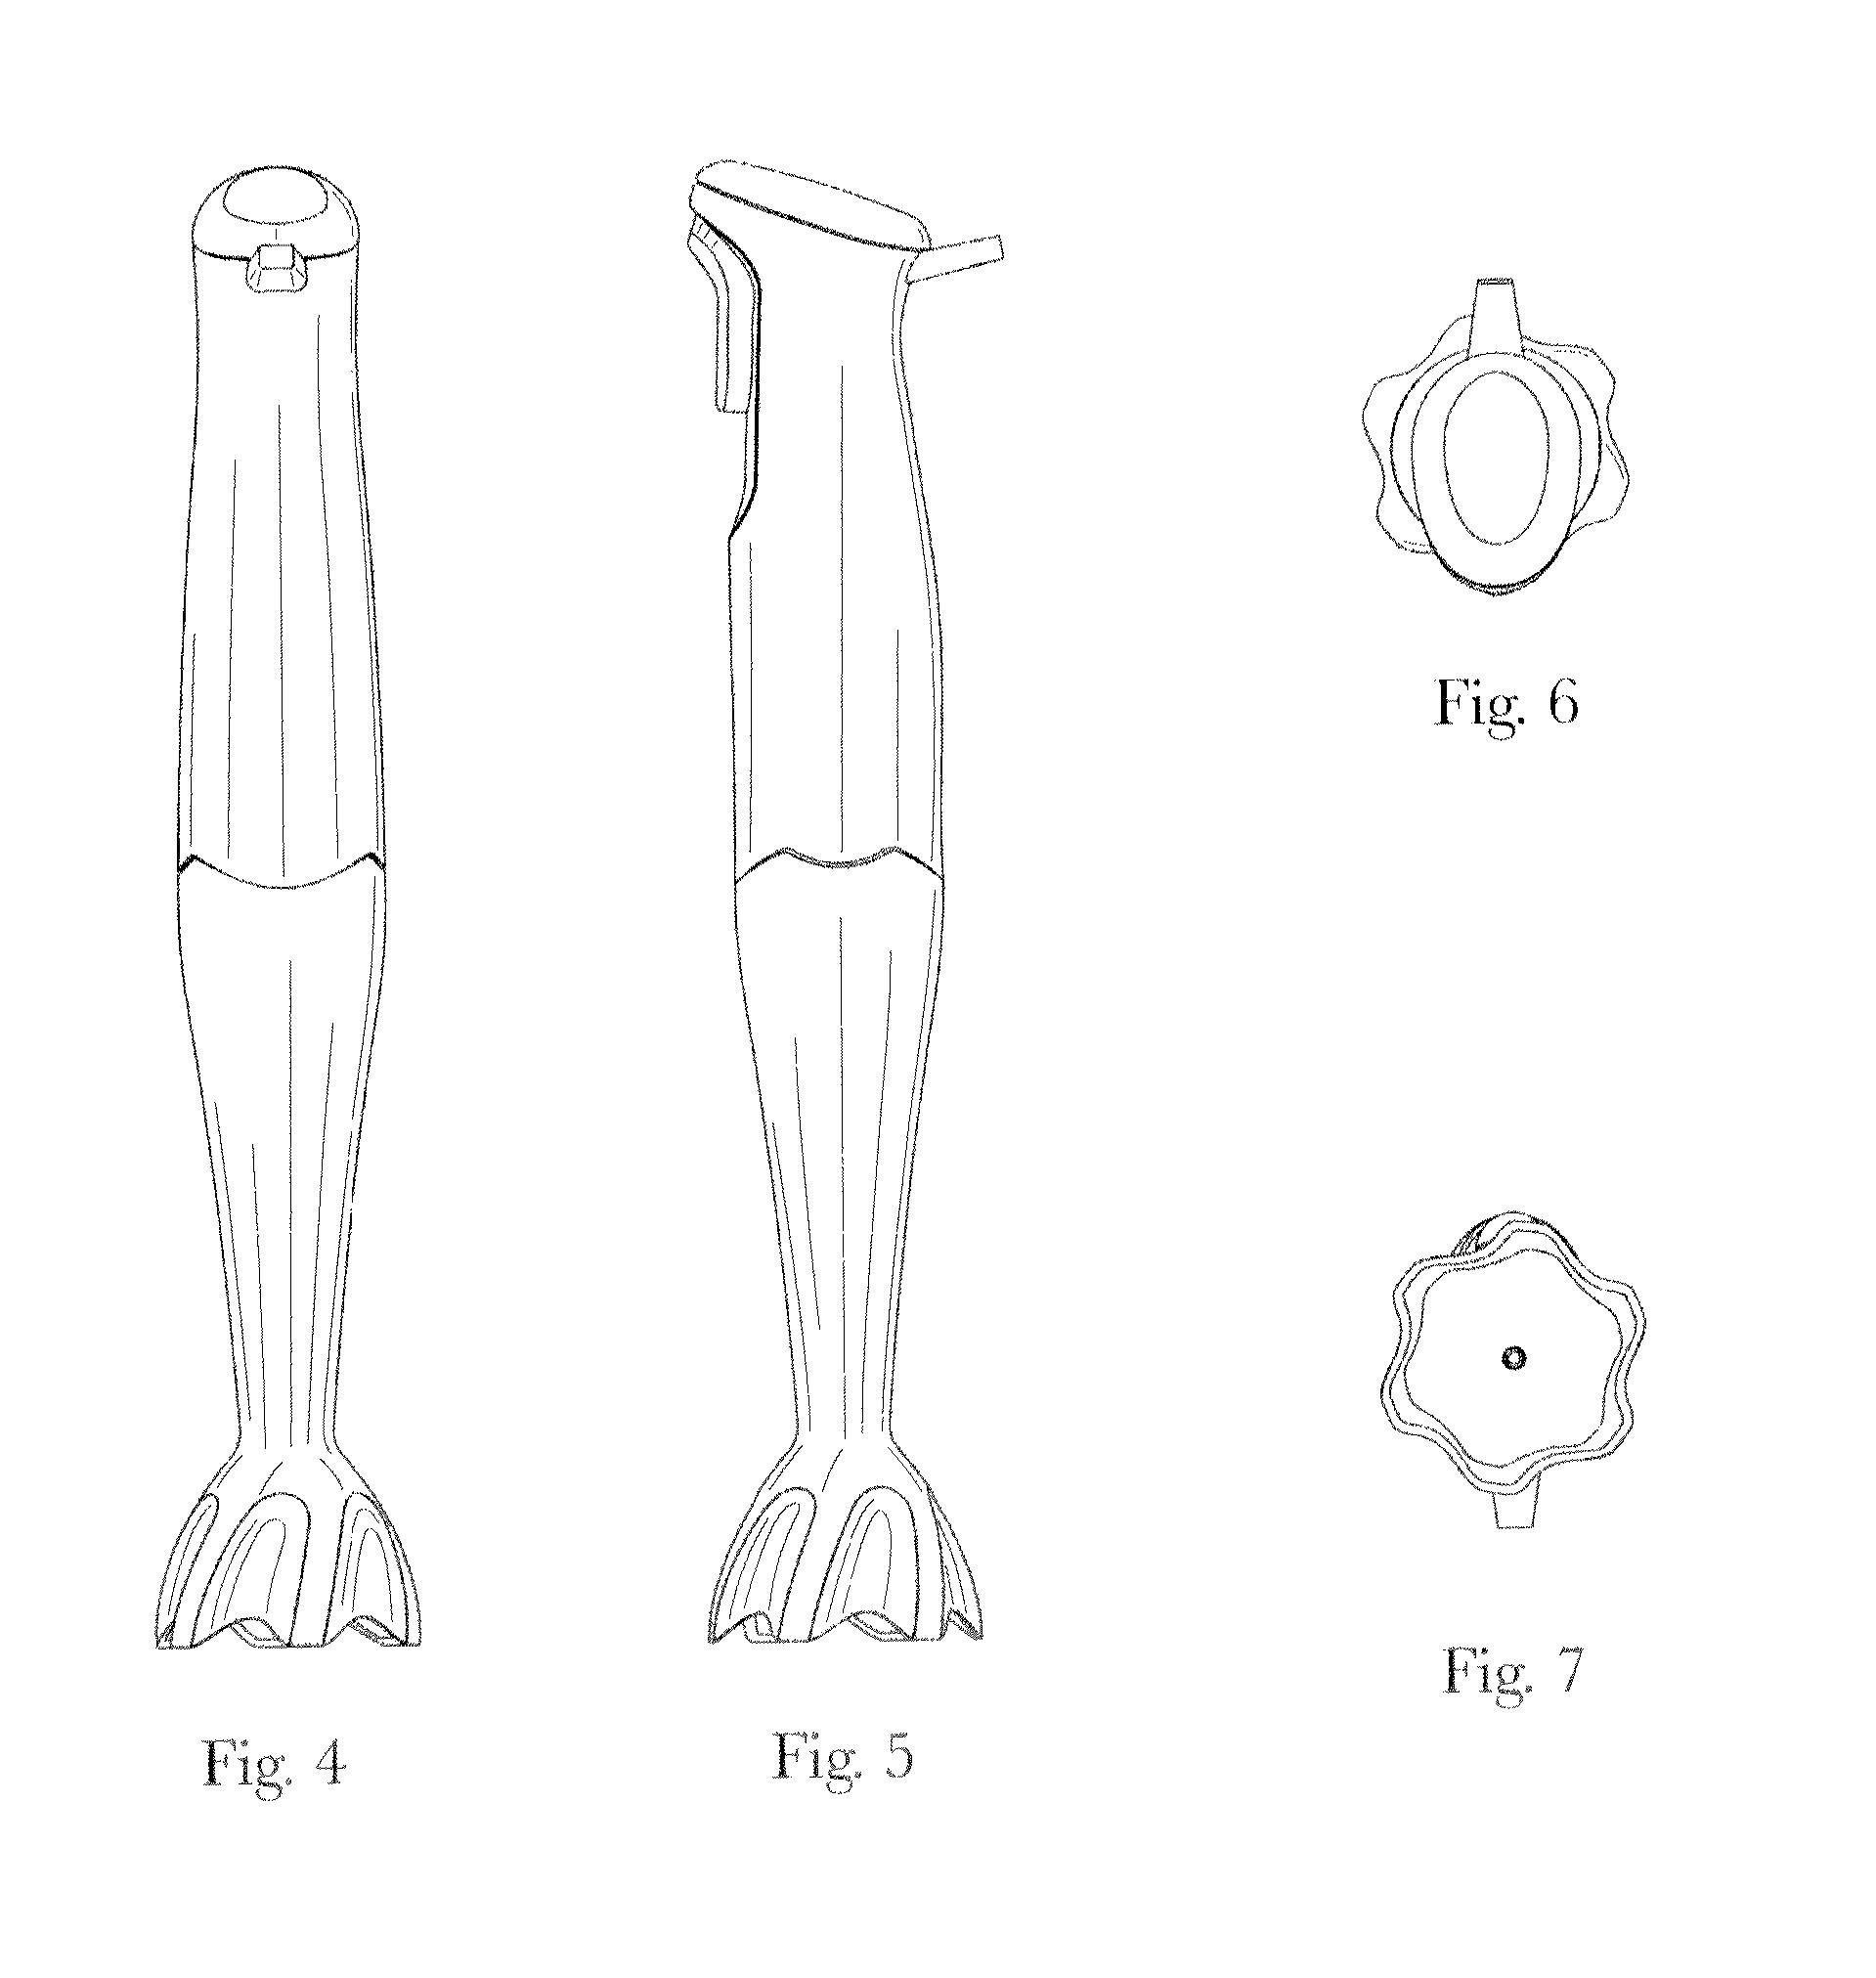 Hand Blender Design ~ Patent usd hand blender google patents